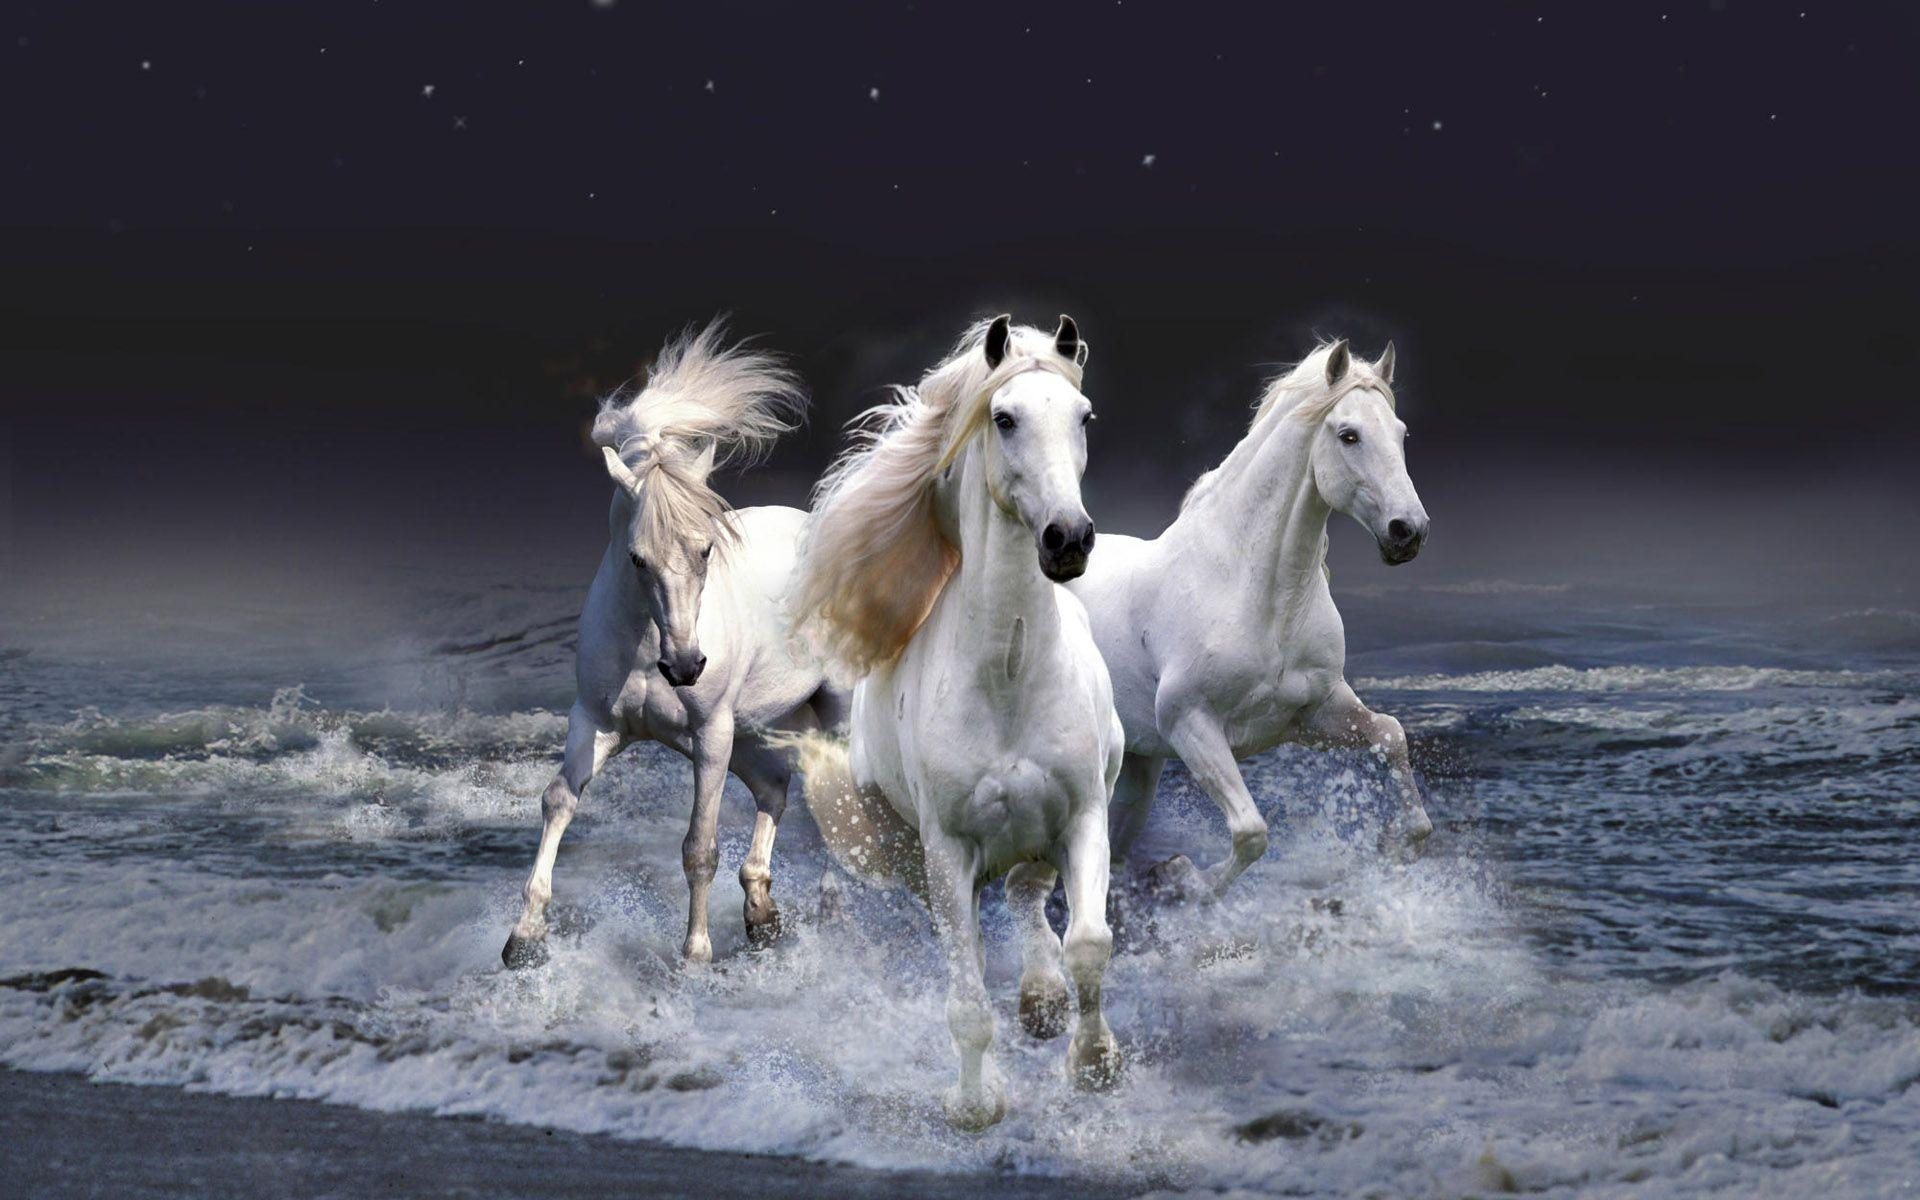 Download Free Running Horses Wallpaper Horse Hd Wallpapers 3d 428360 Hd Wallpaper Backgrounds Download